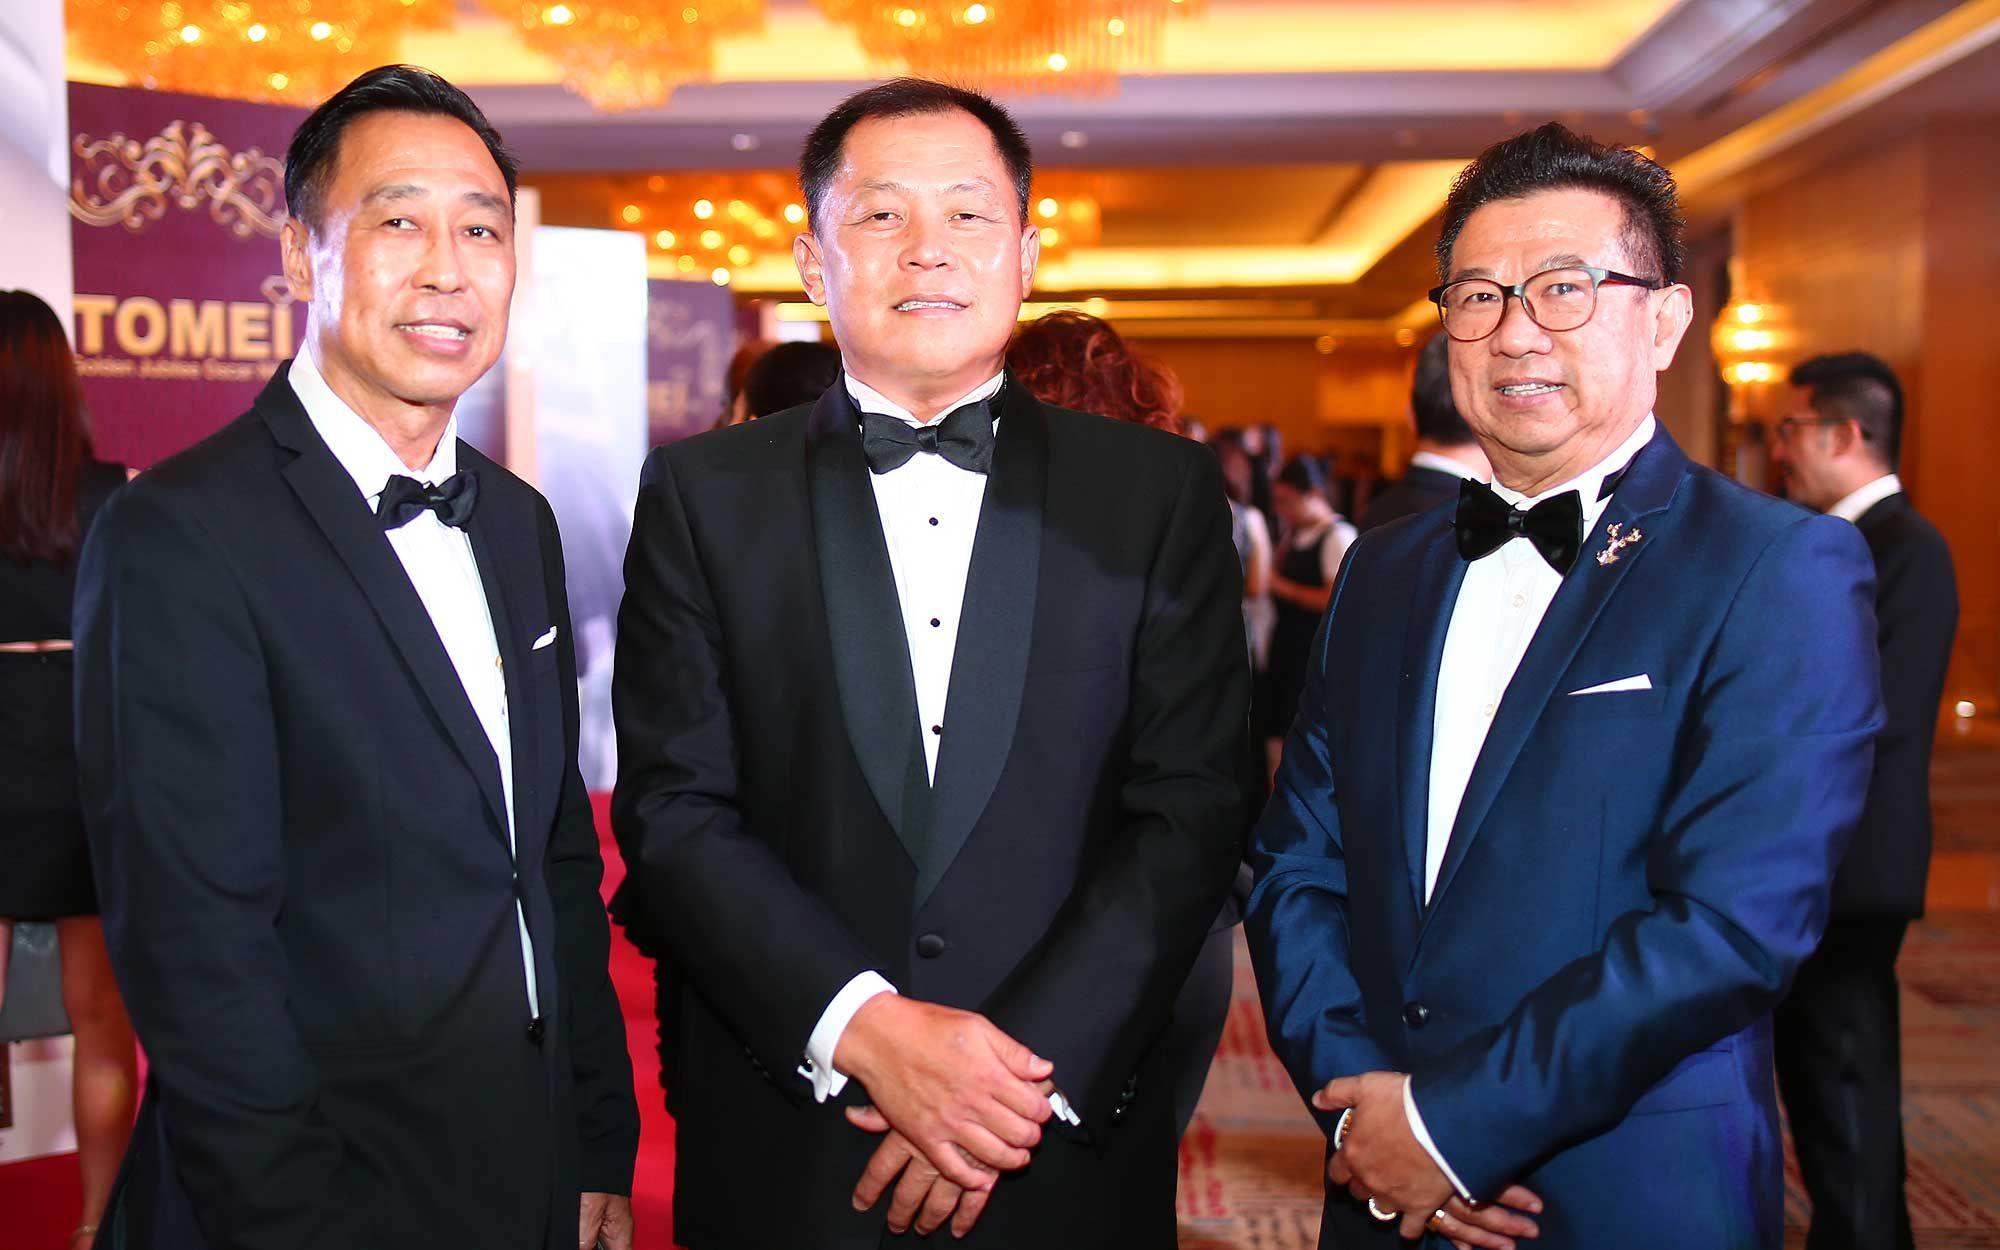 Timmy Au, Datuk Wira Richard Lau and Dato' Dr. Ir. Andy Seo Kian Haw